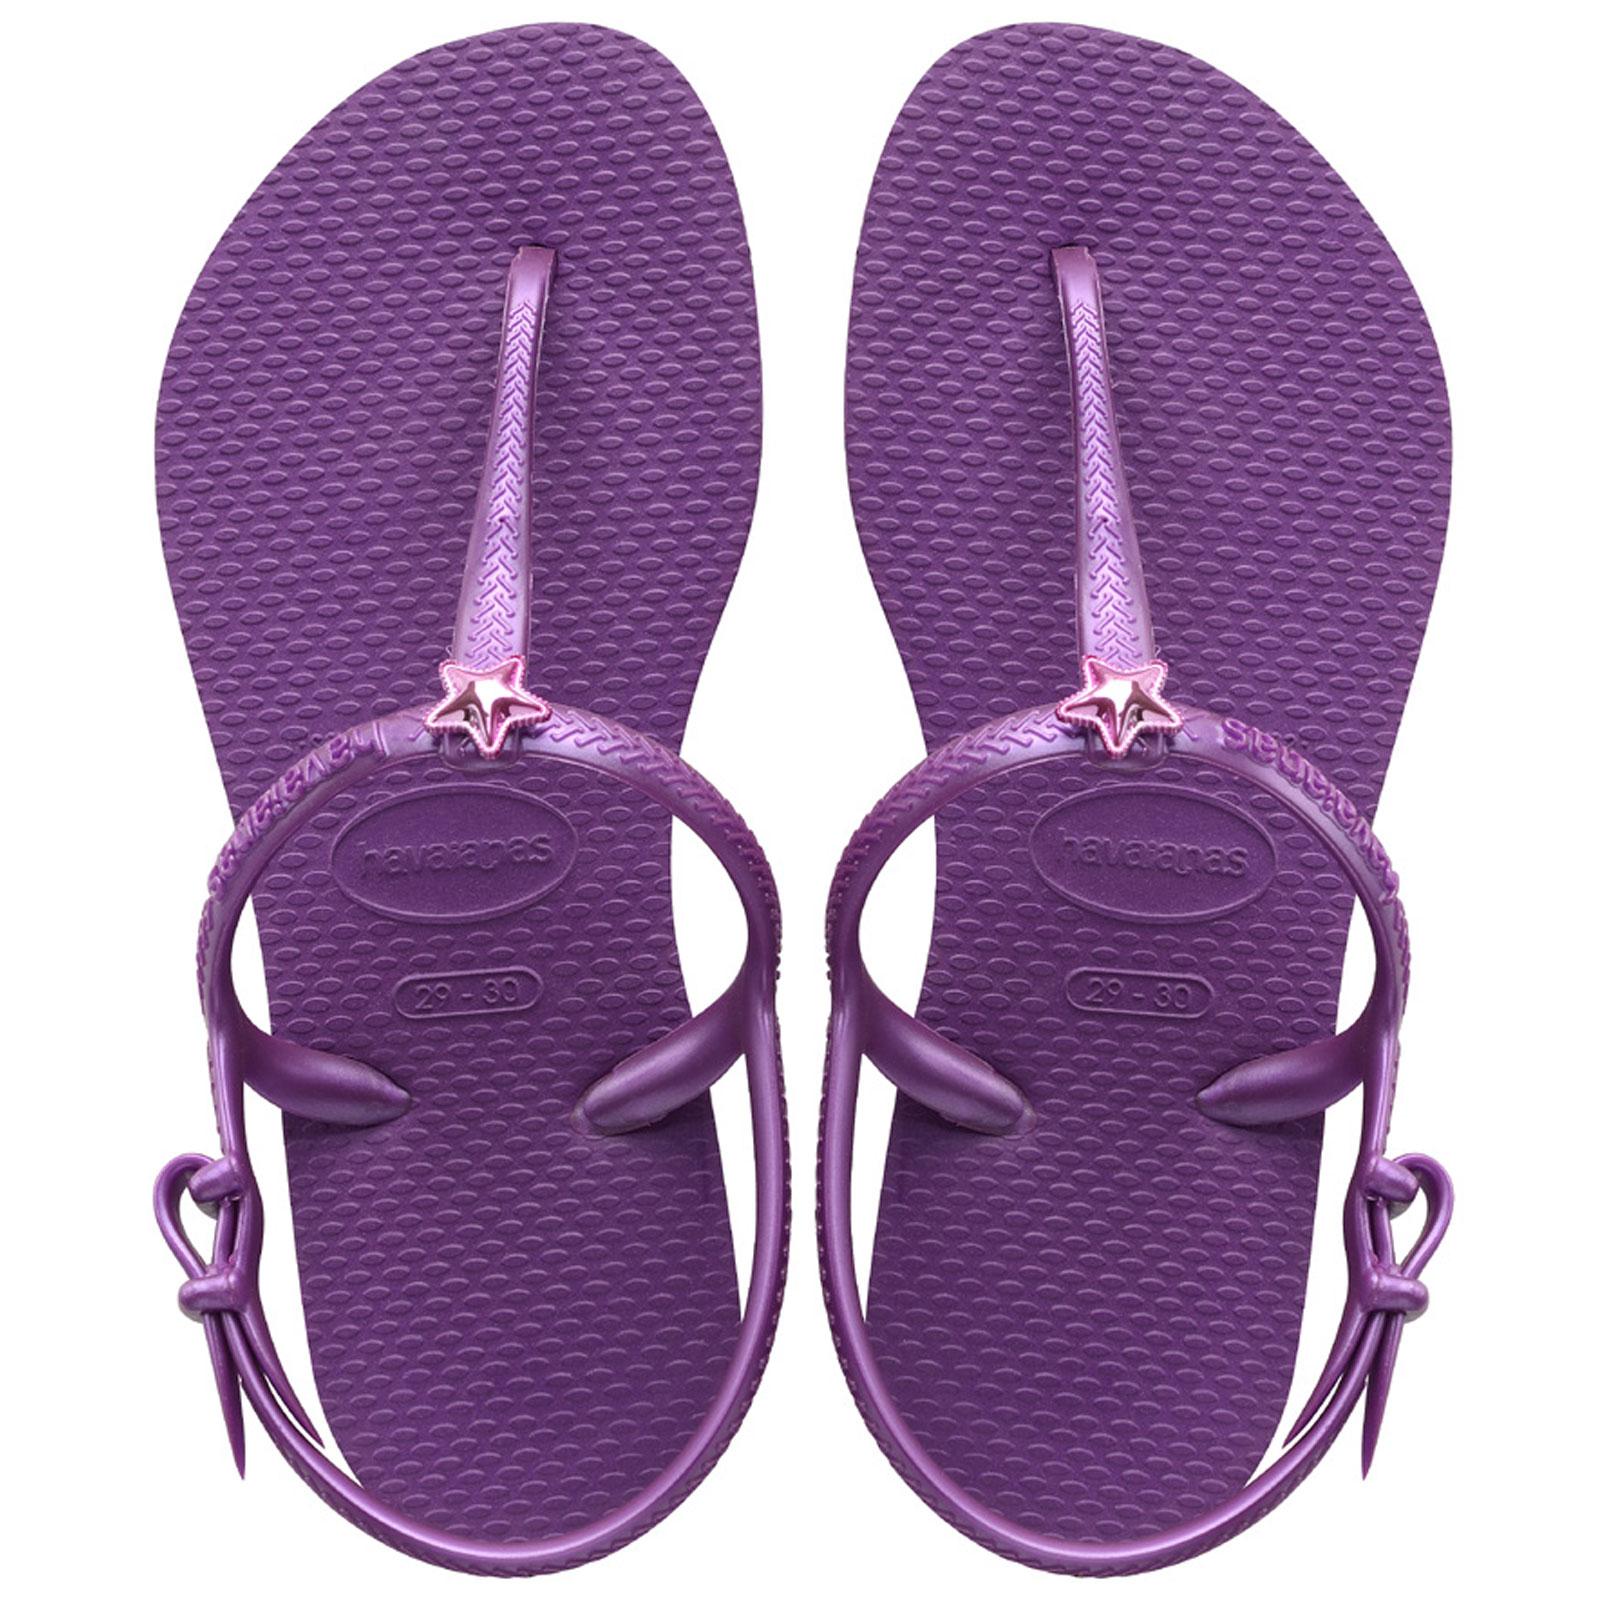 c43c230e0 Sandals Kids Freedom Royal Purple - Brand Havaianas